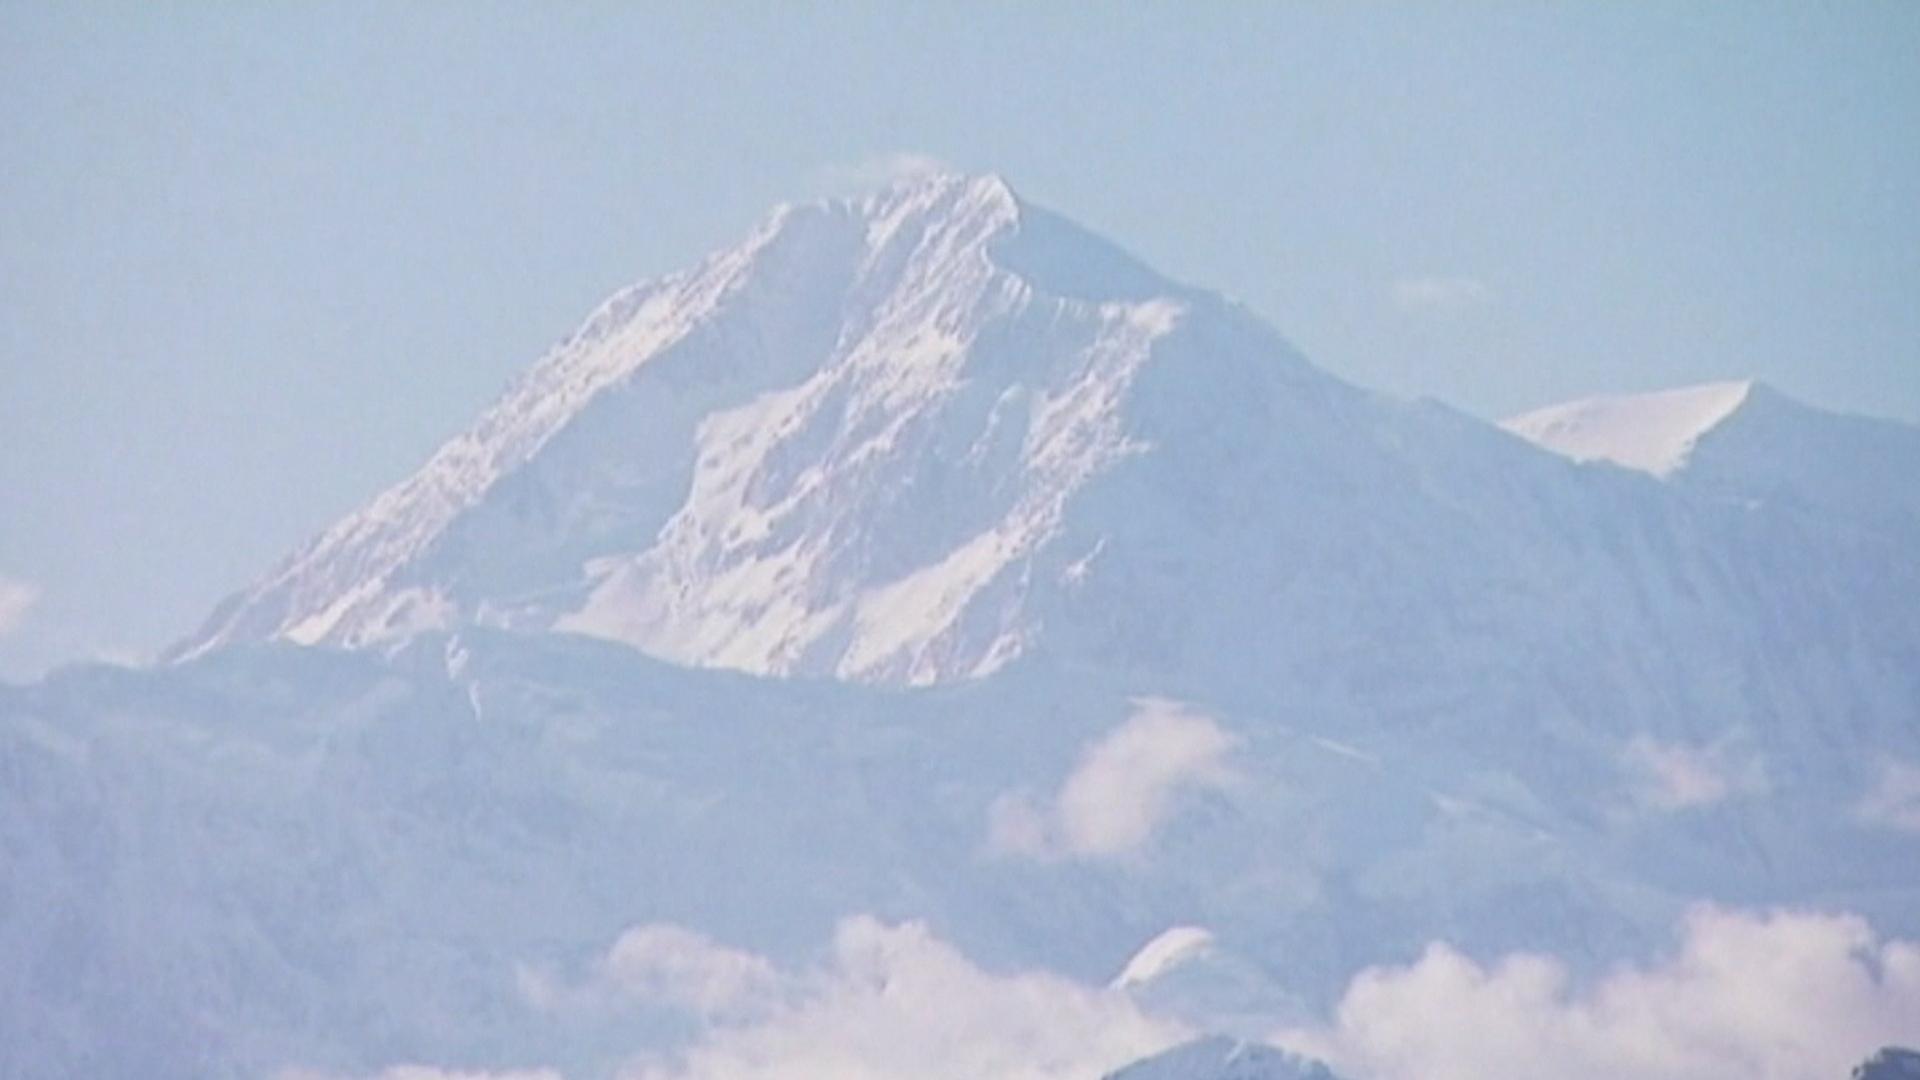 McKinley Out, Denali In: Highest Peak in North America Renamed